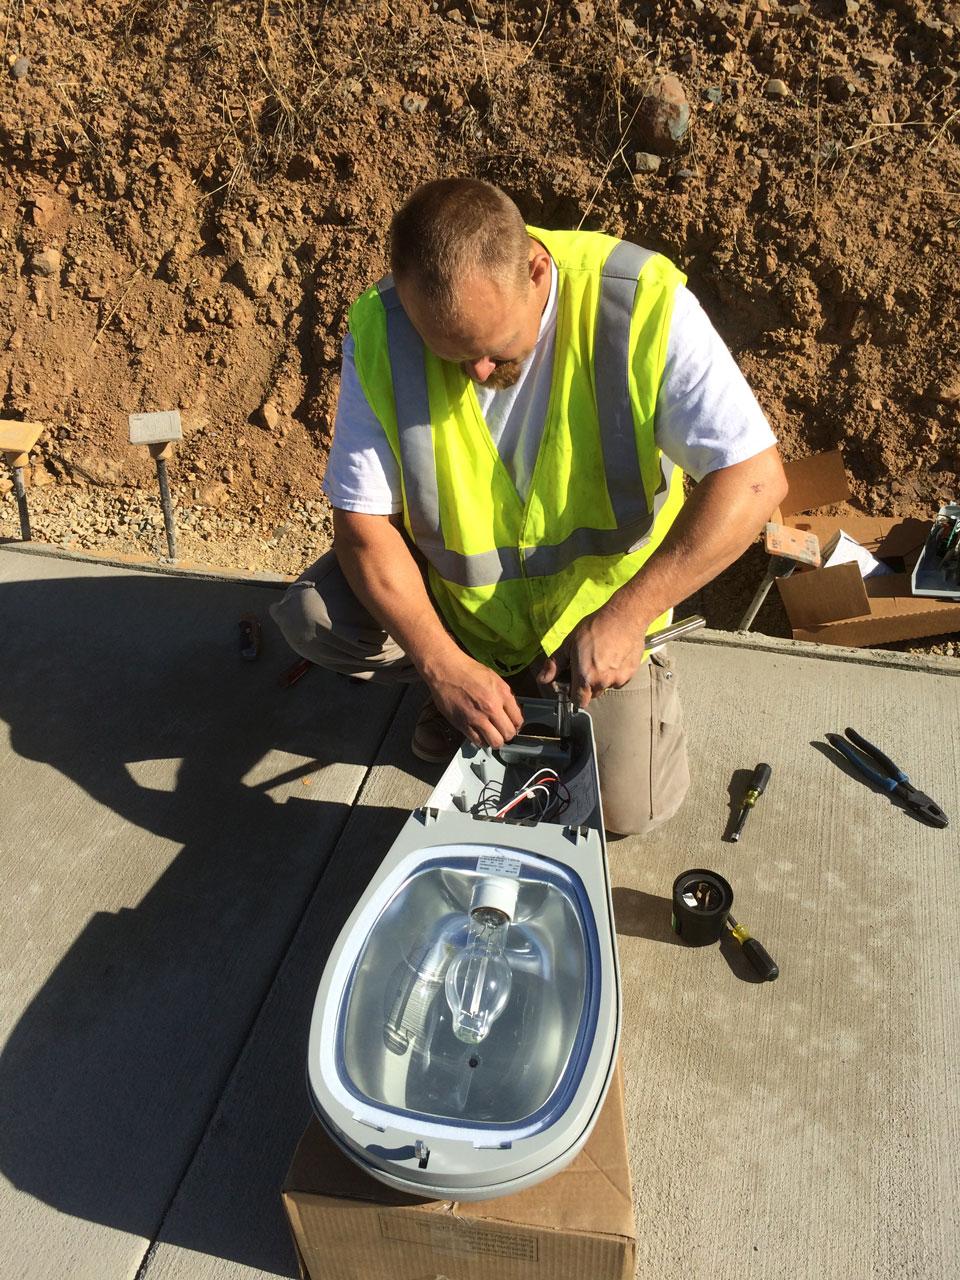 Bullert Team Member Fixing a Device